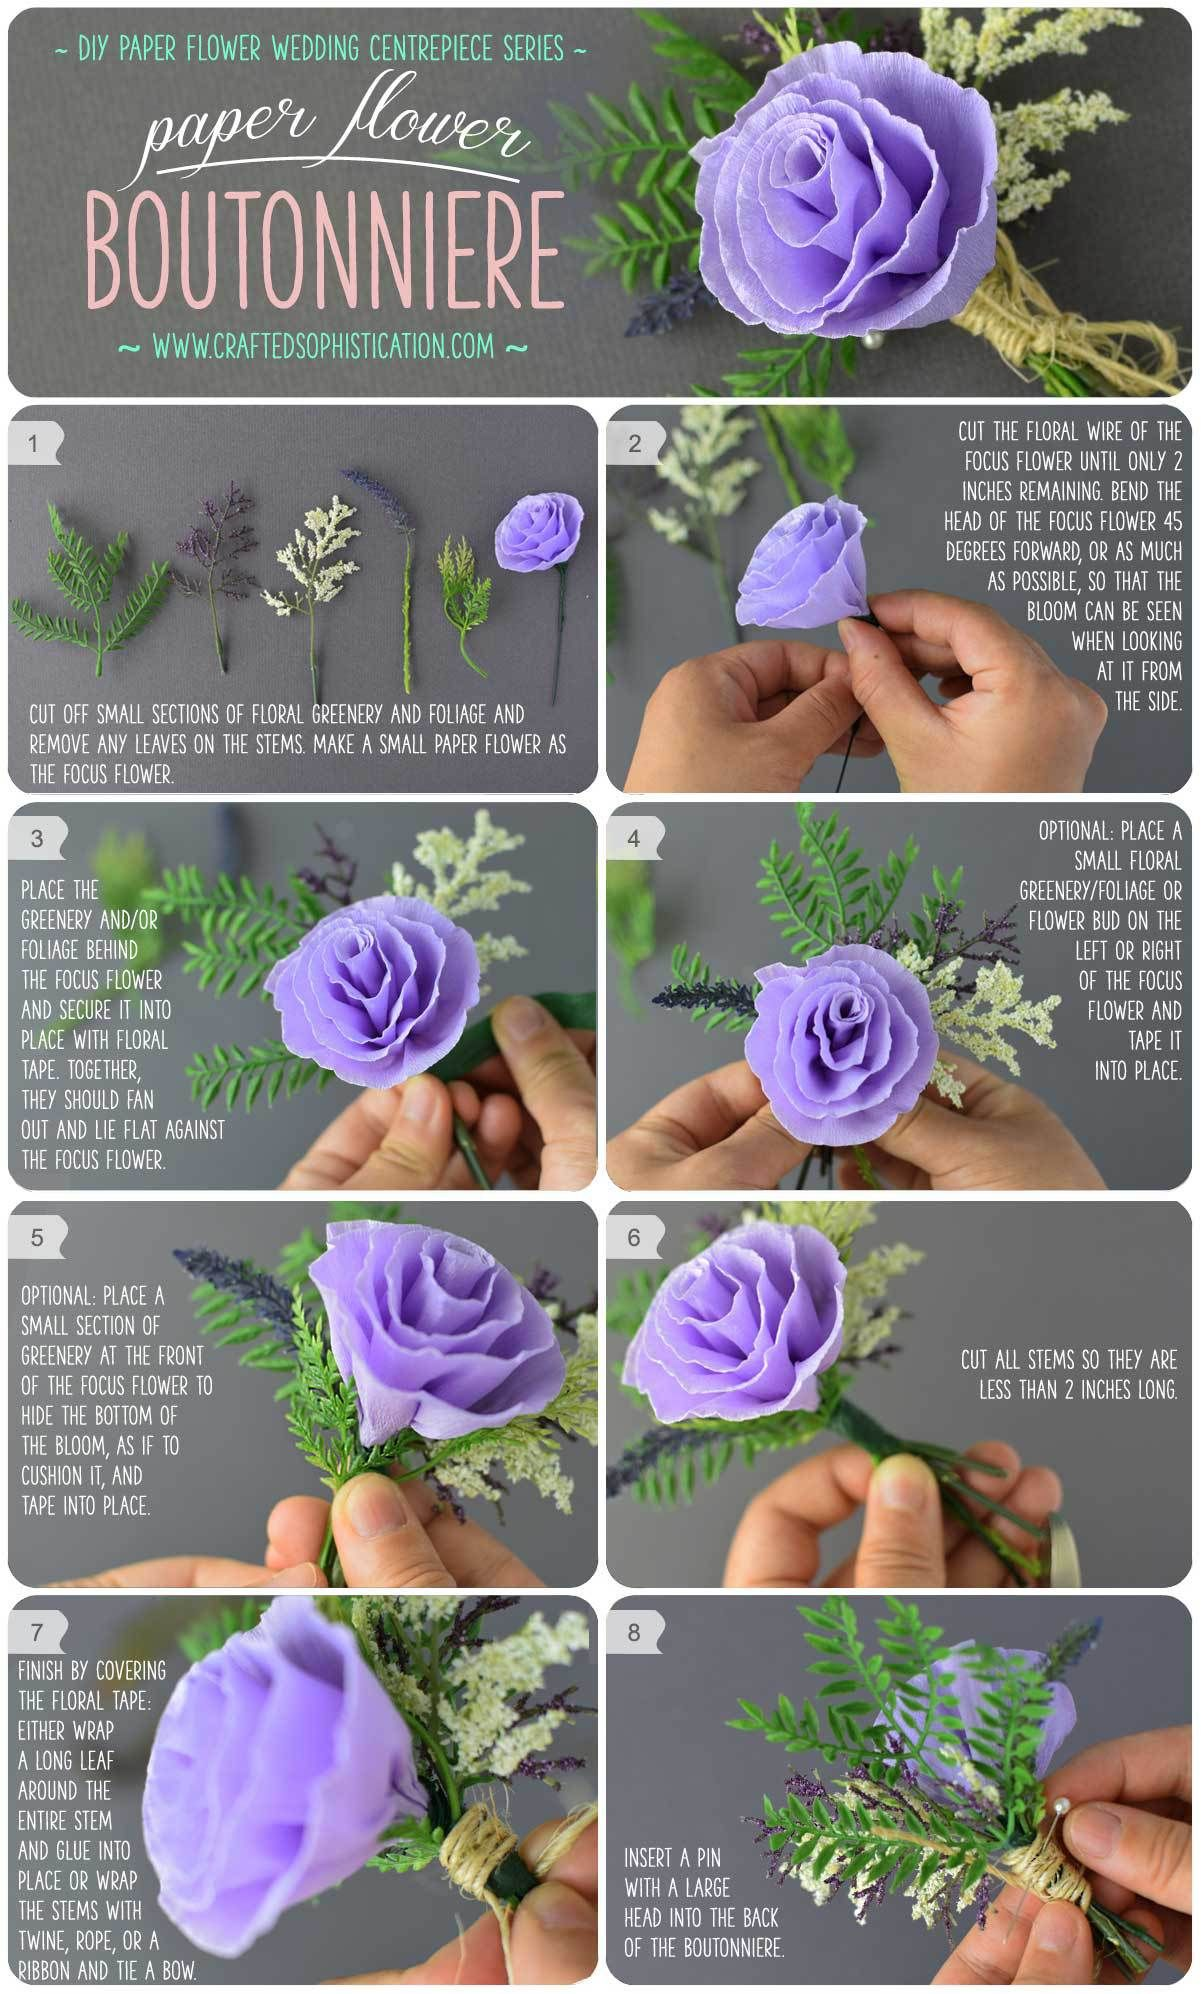 Diy Paper Flower Boutonniere Diy Pinterest Diy Paper